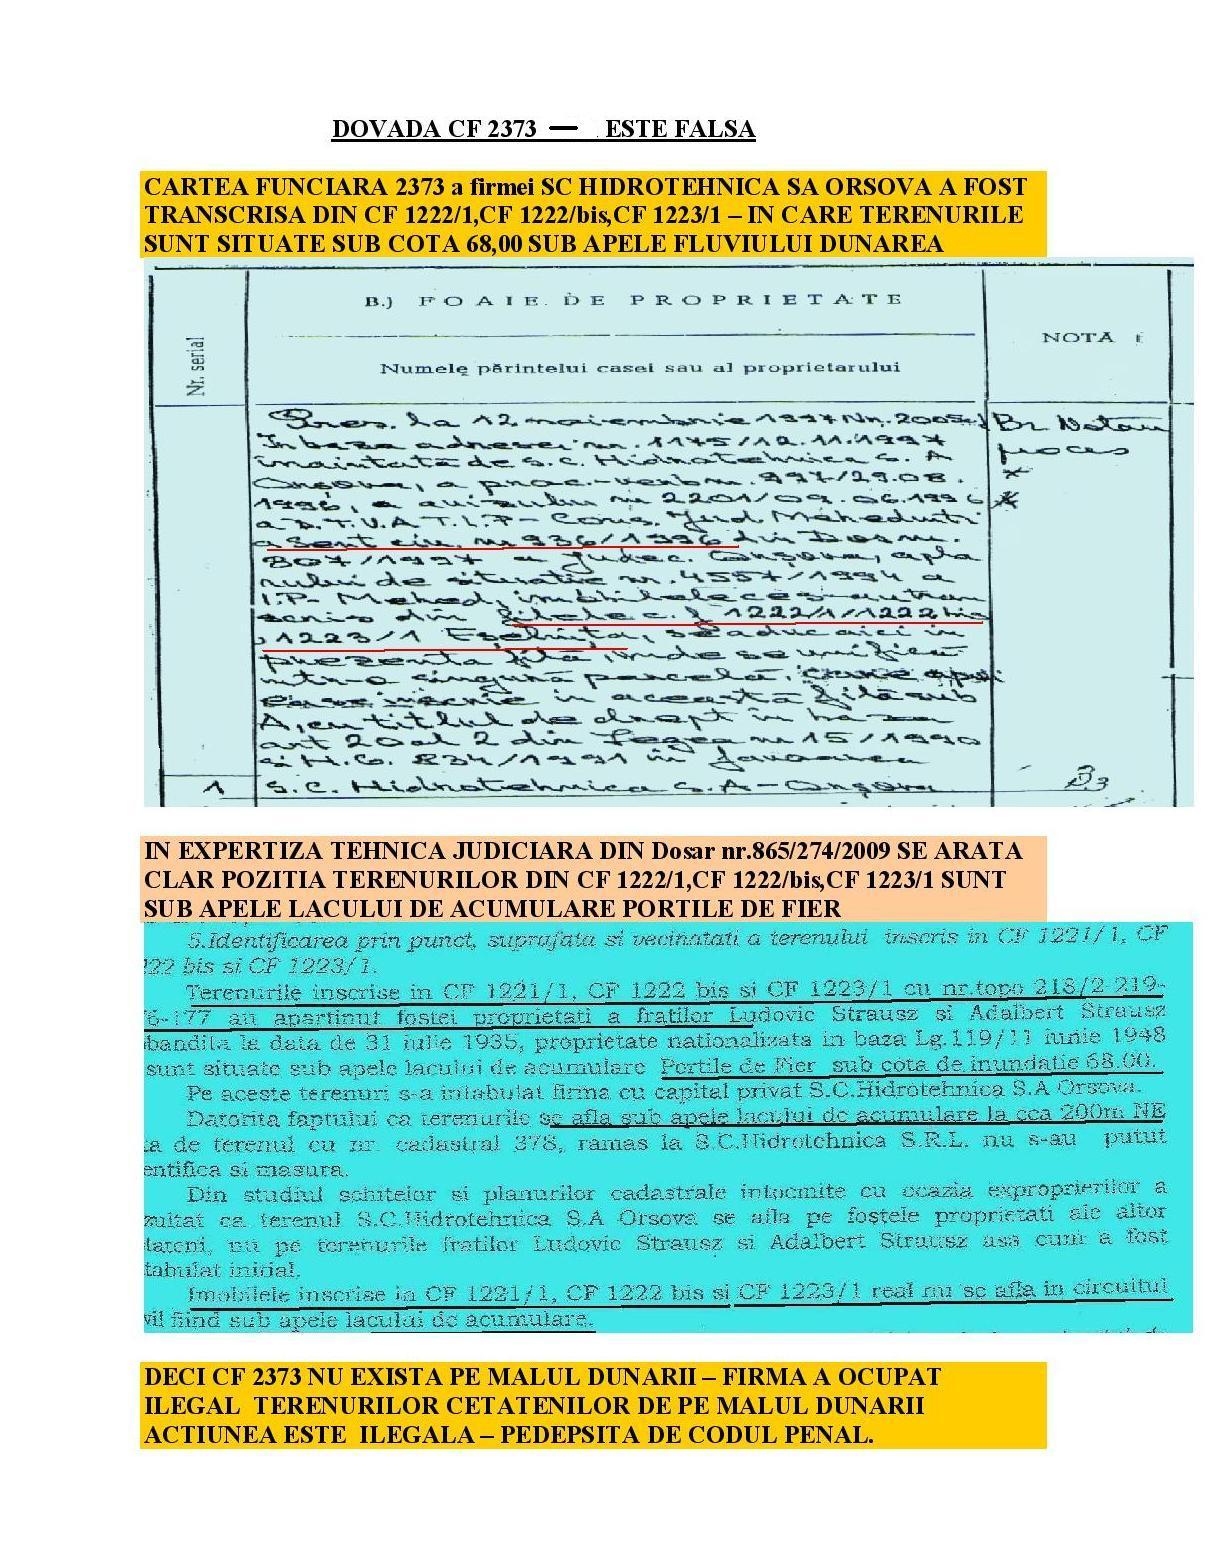 CARTEA FUNCIARA FALSA CF 2373